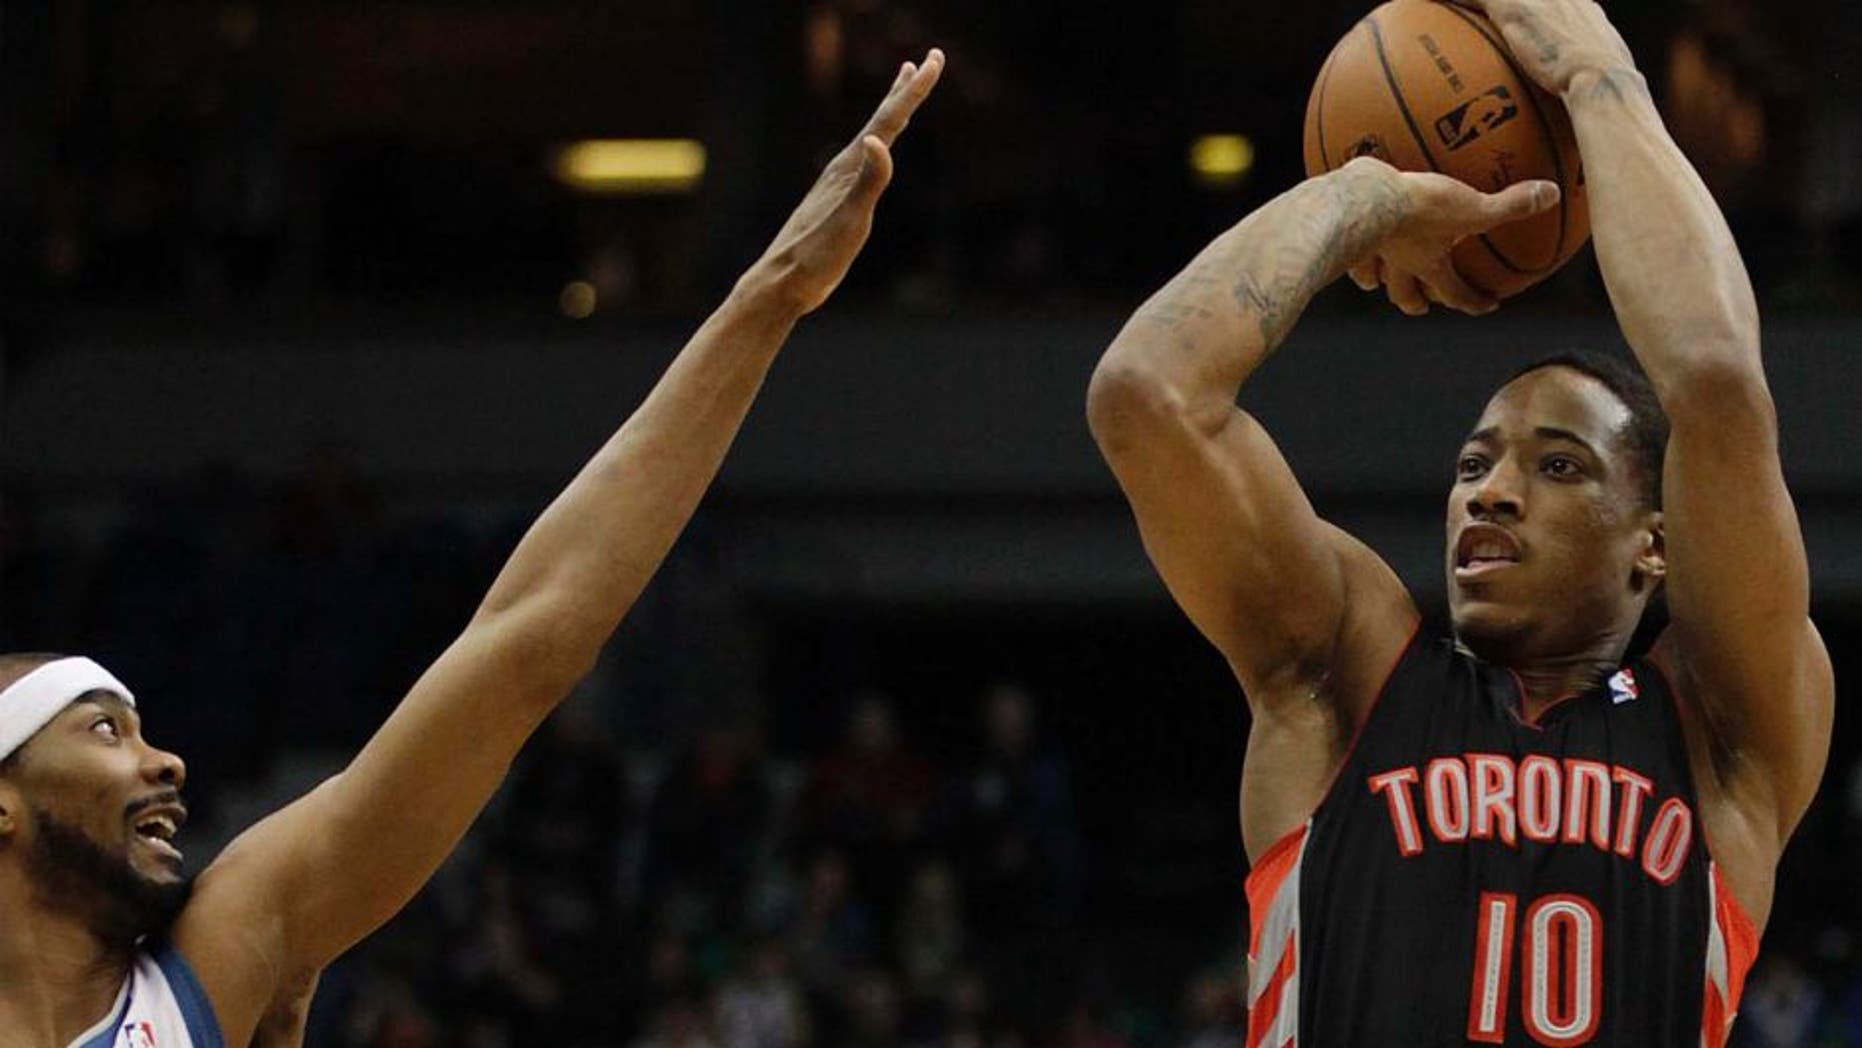 Toronto Raptors guard DeMar DeRozan (right) shoots against Minnesota Timberwolves guard Corey Brewer in the first half.